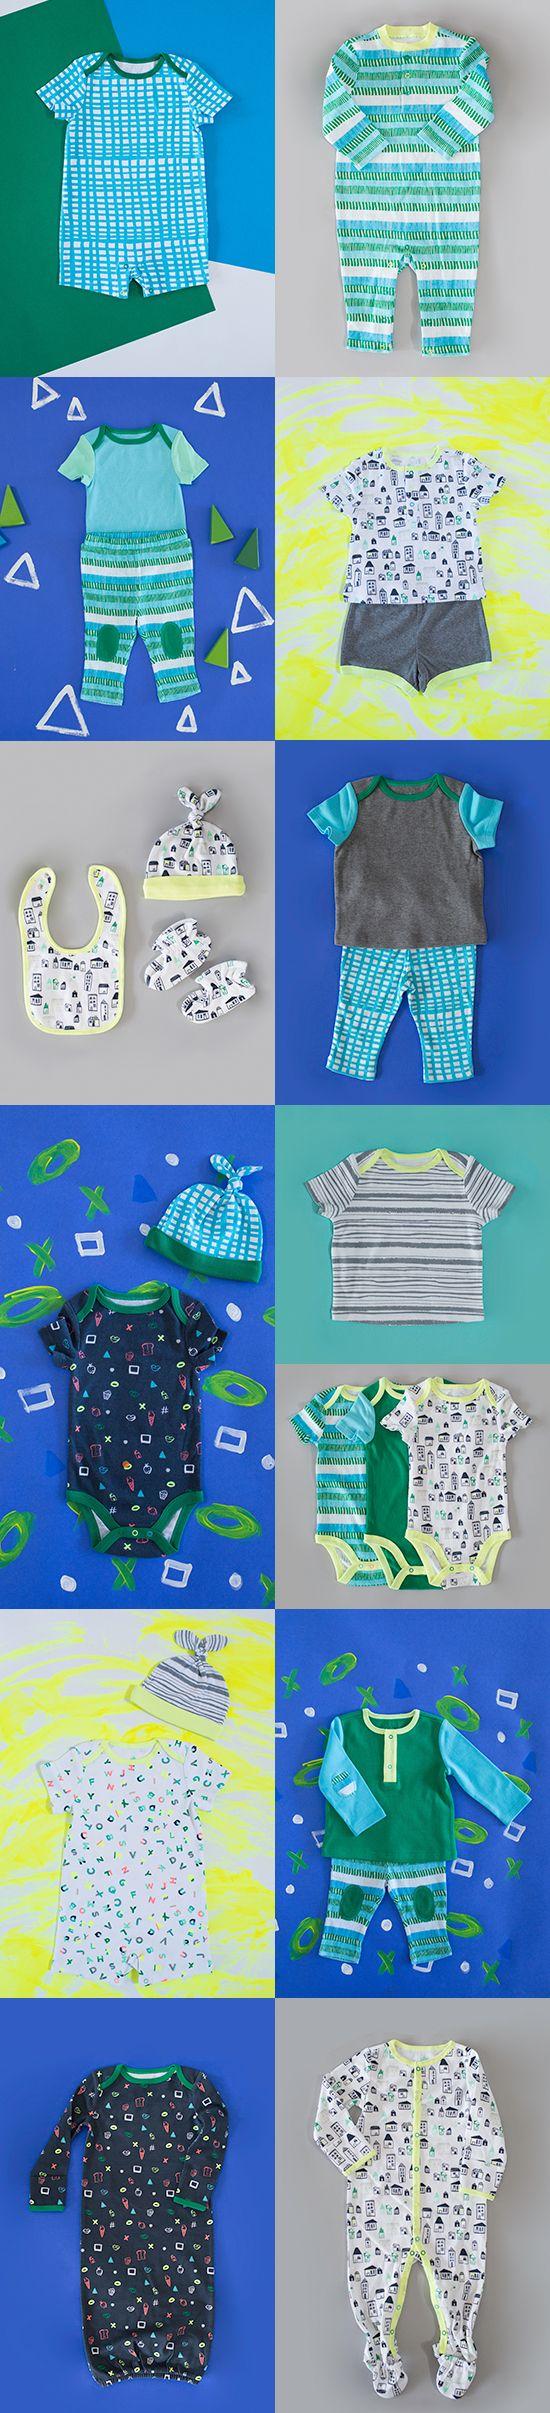 Oh Joy for Target - baby boy apparel